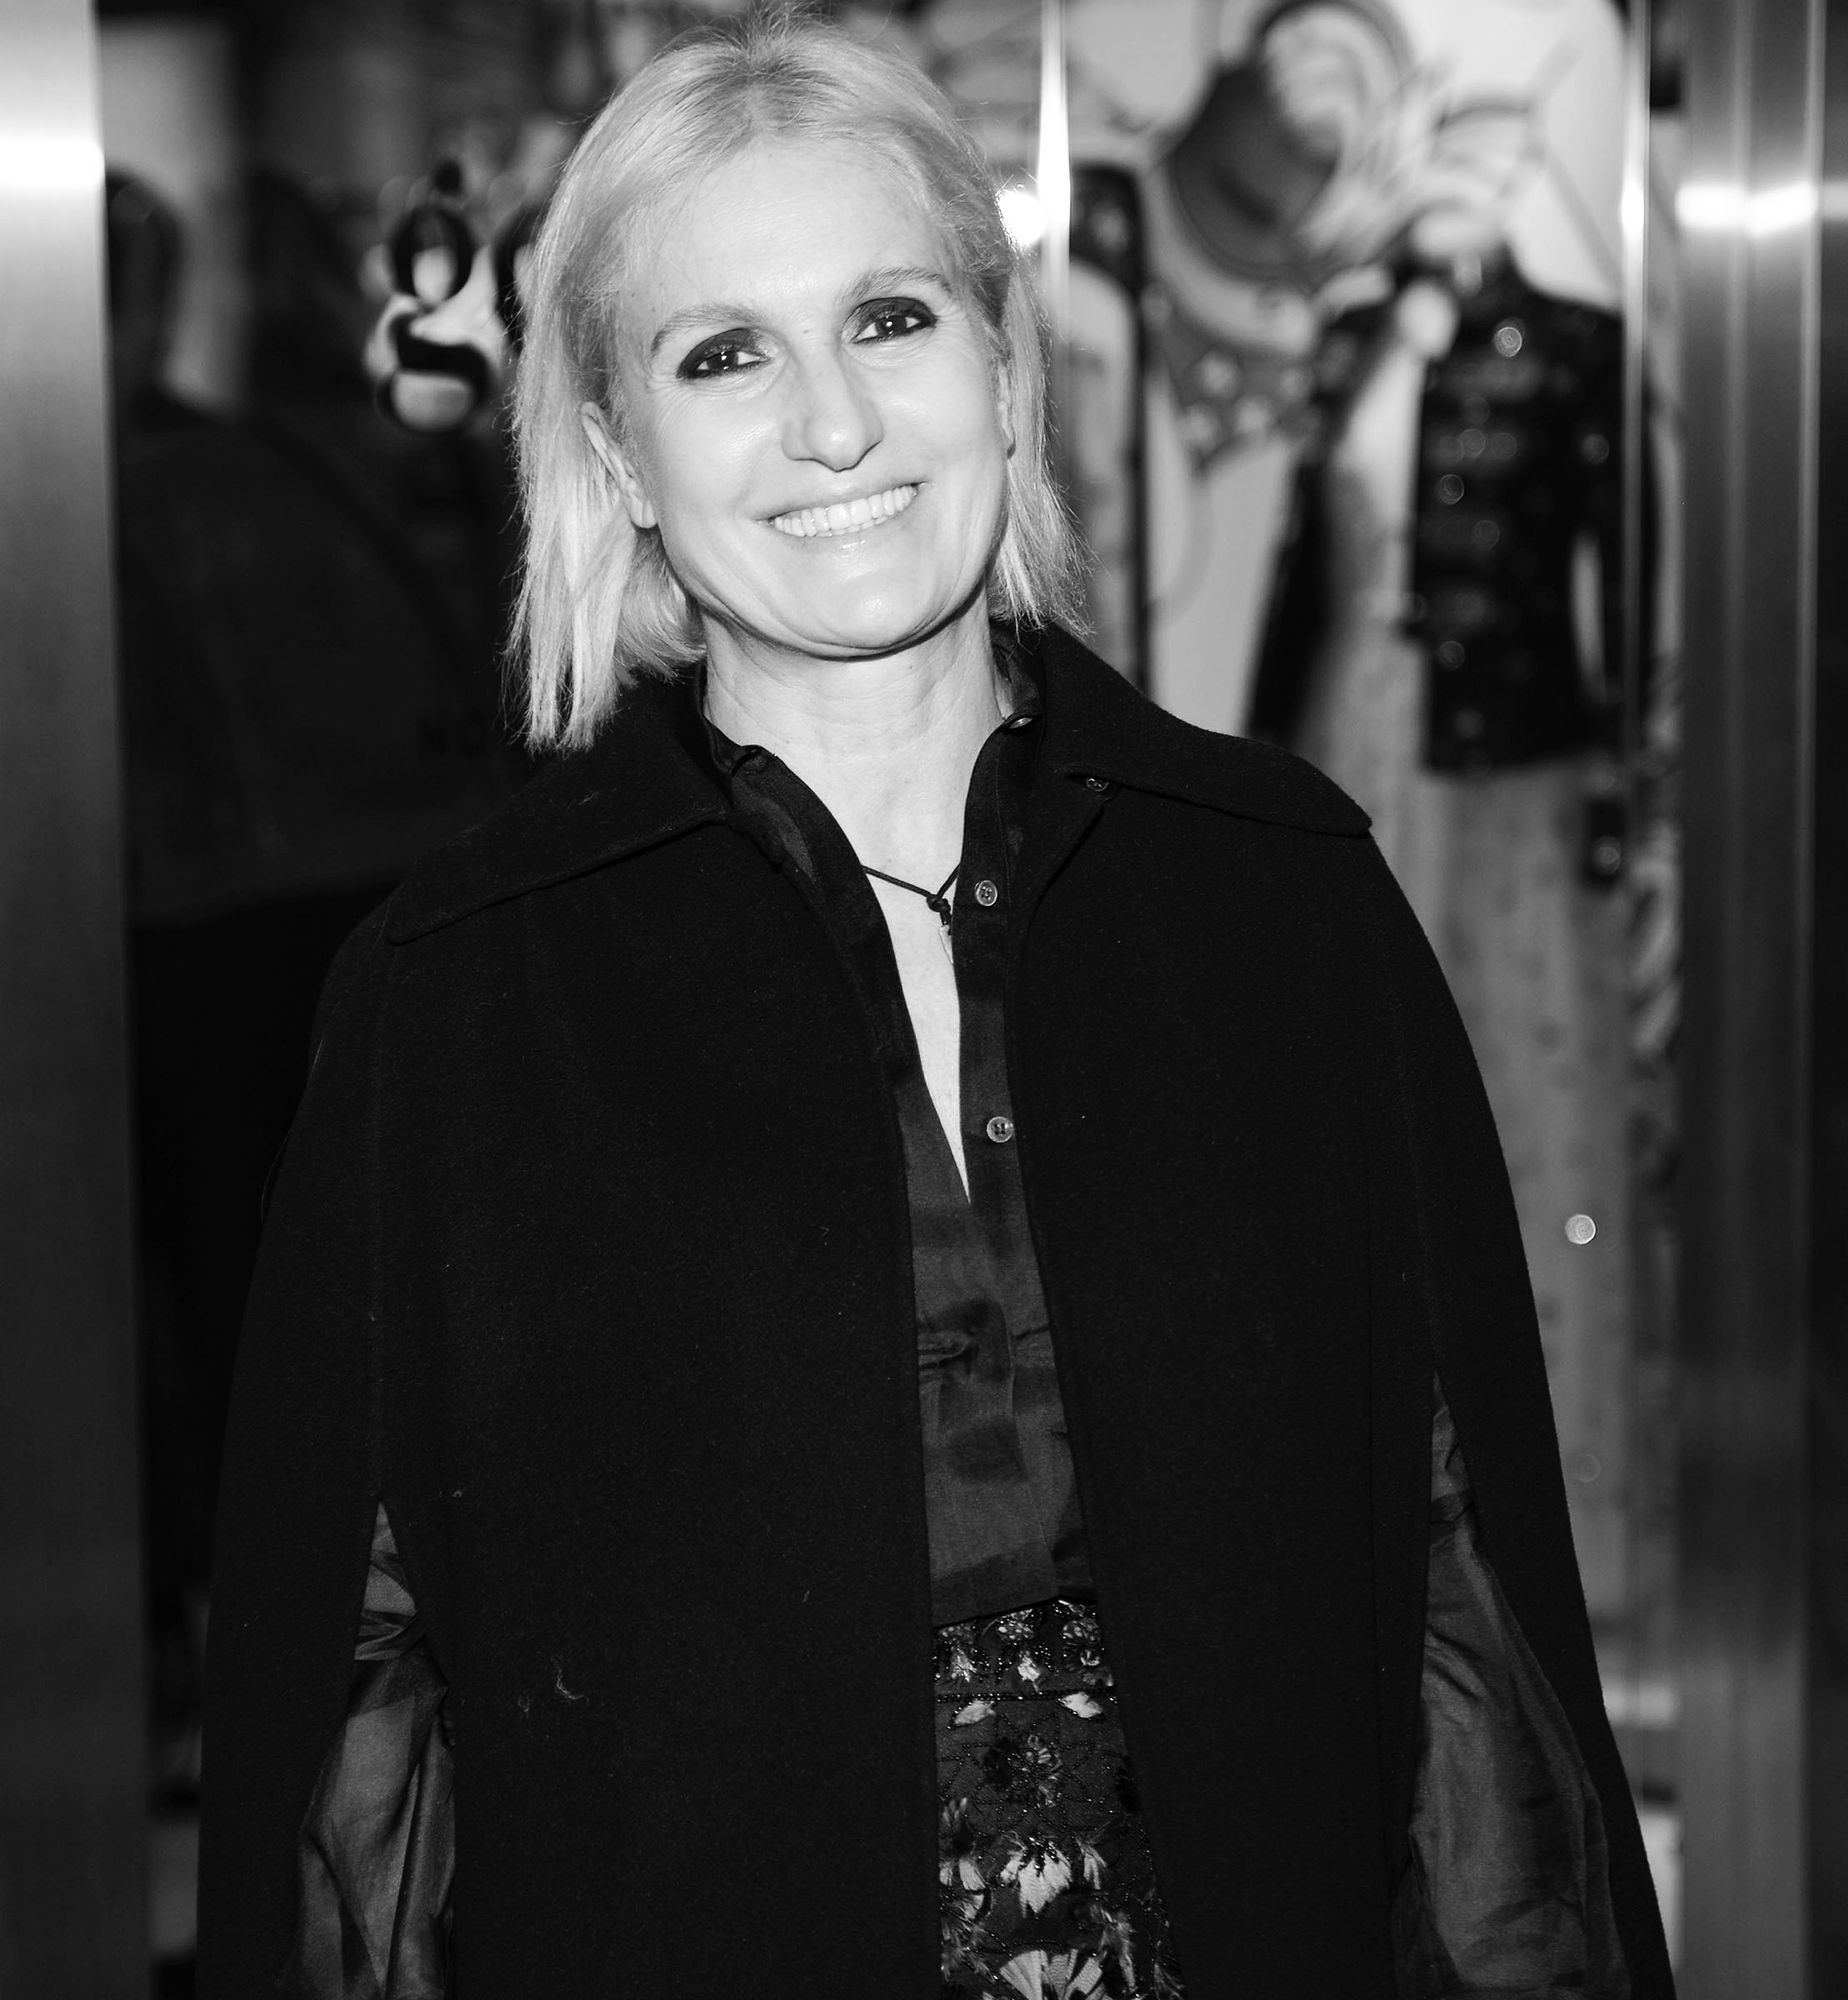 Dior anuncia nova diretora criativa: Maria Grazia Chiuri